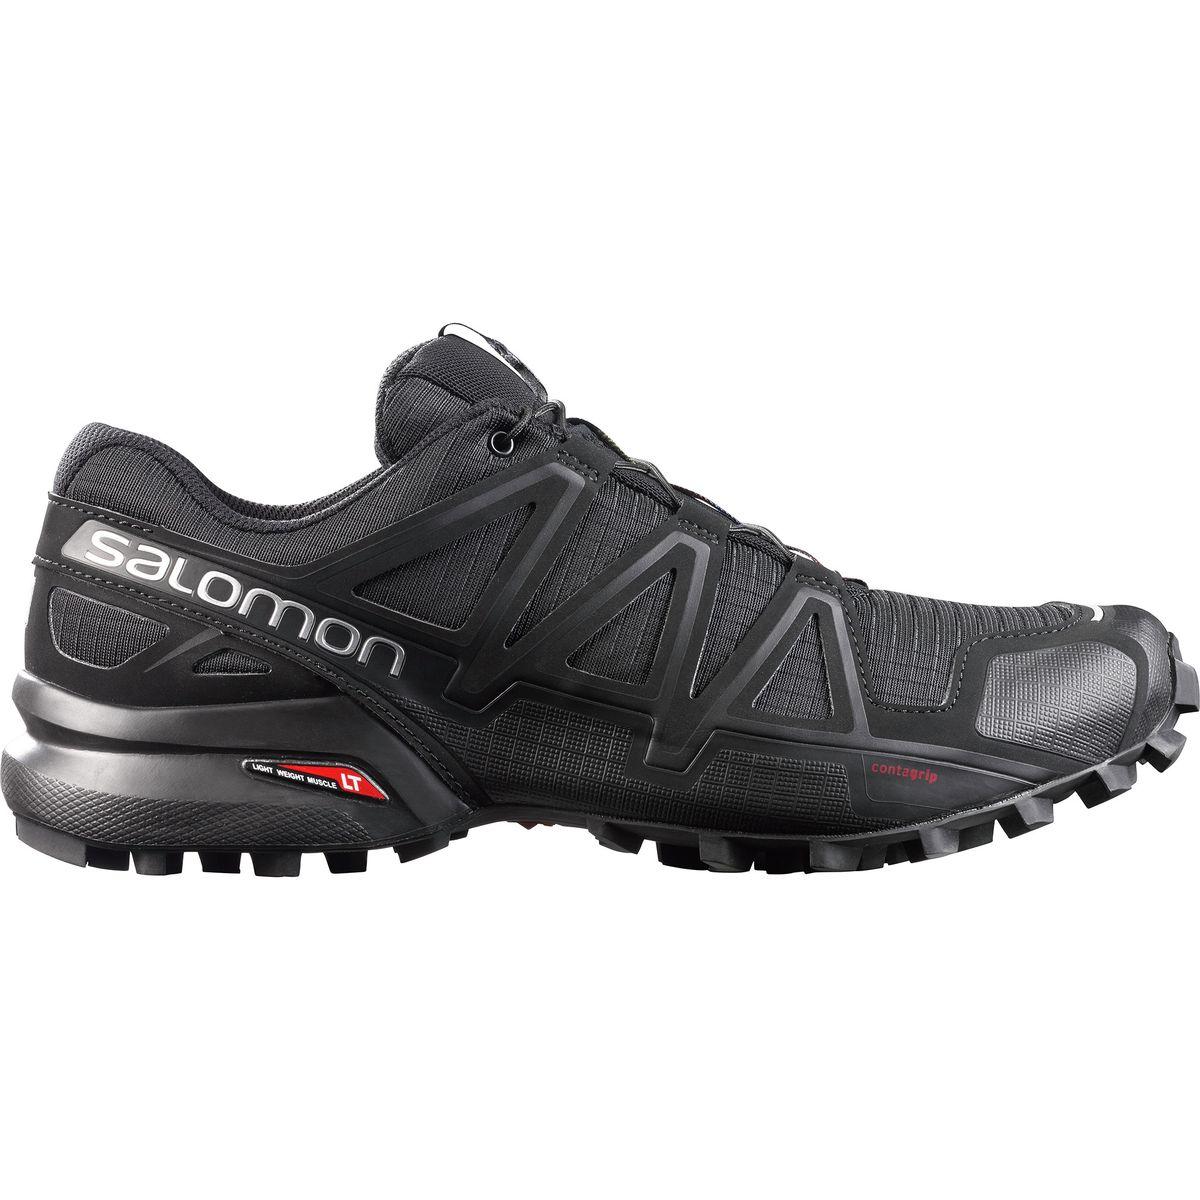 Salomon Speedcross 4 Trail Running Shoe Men's